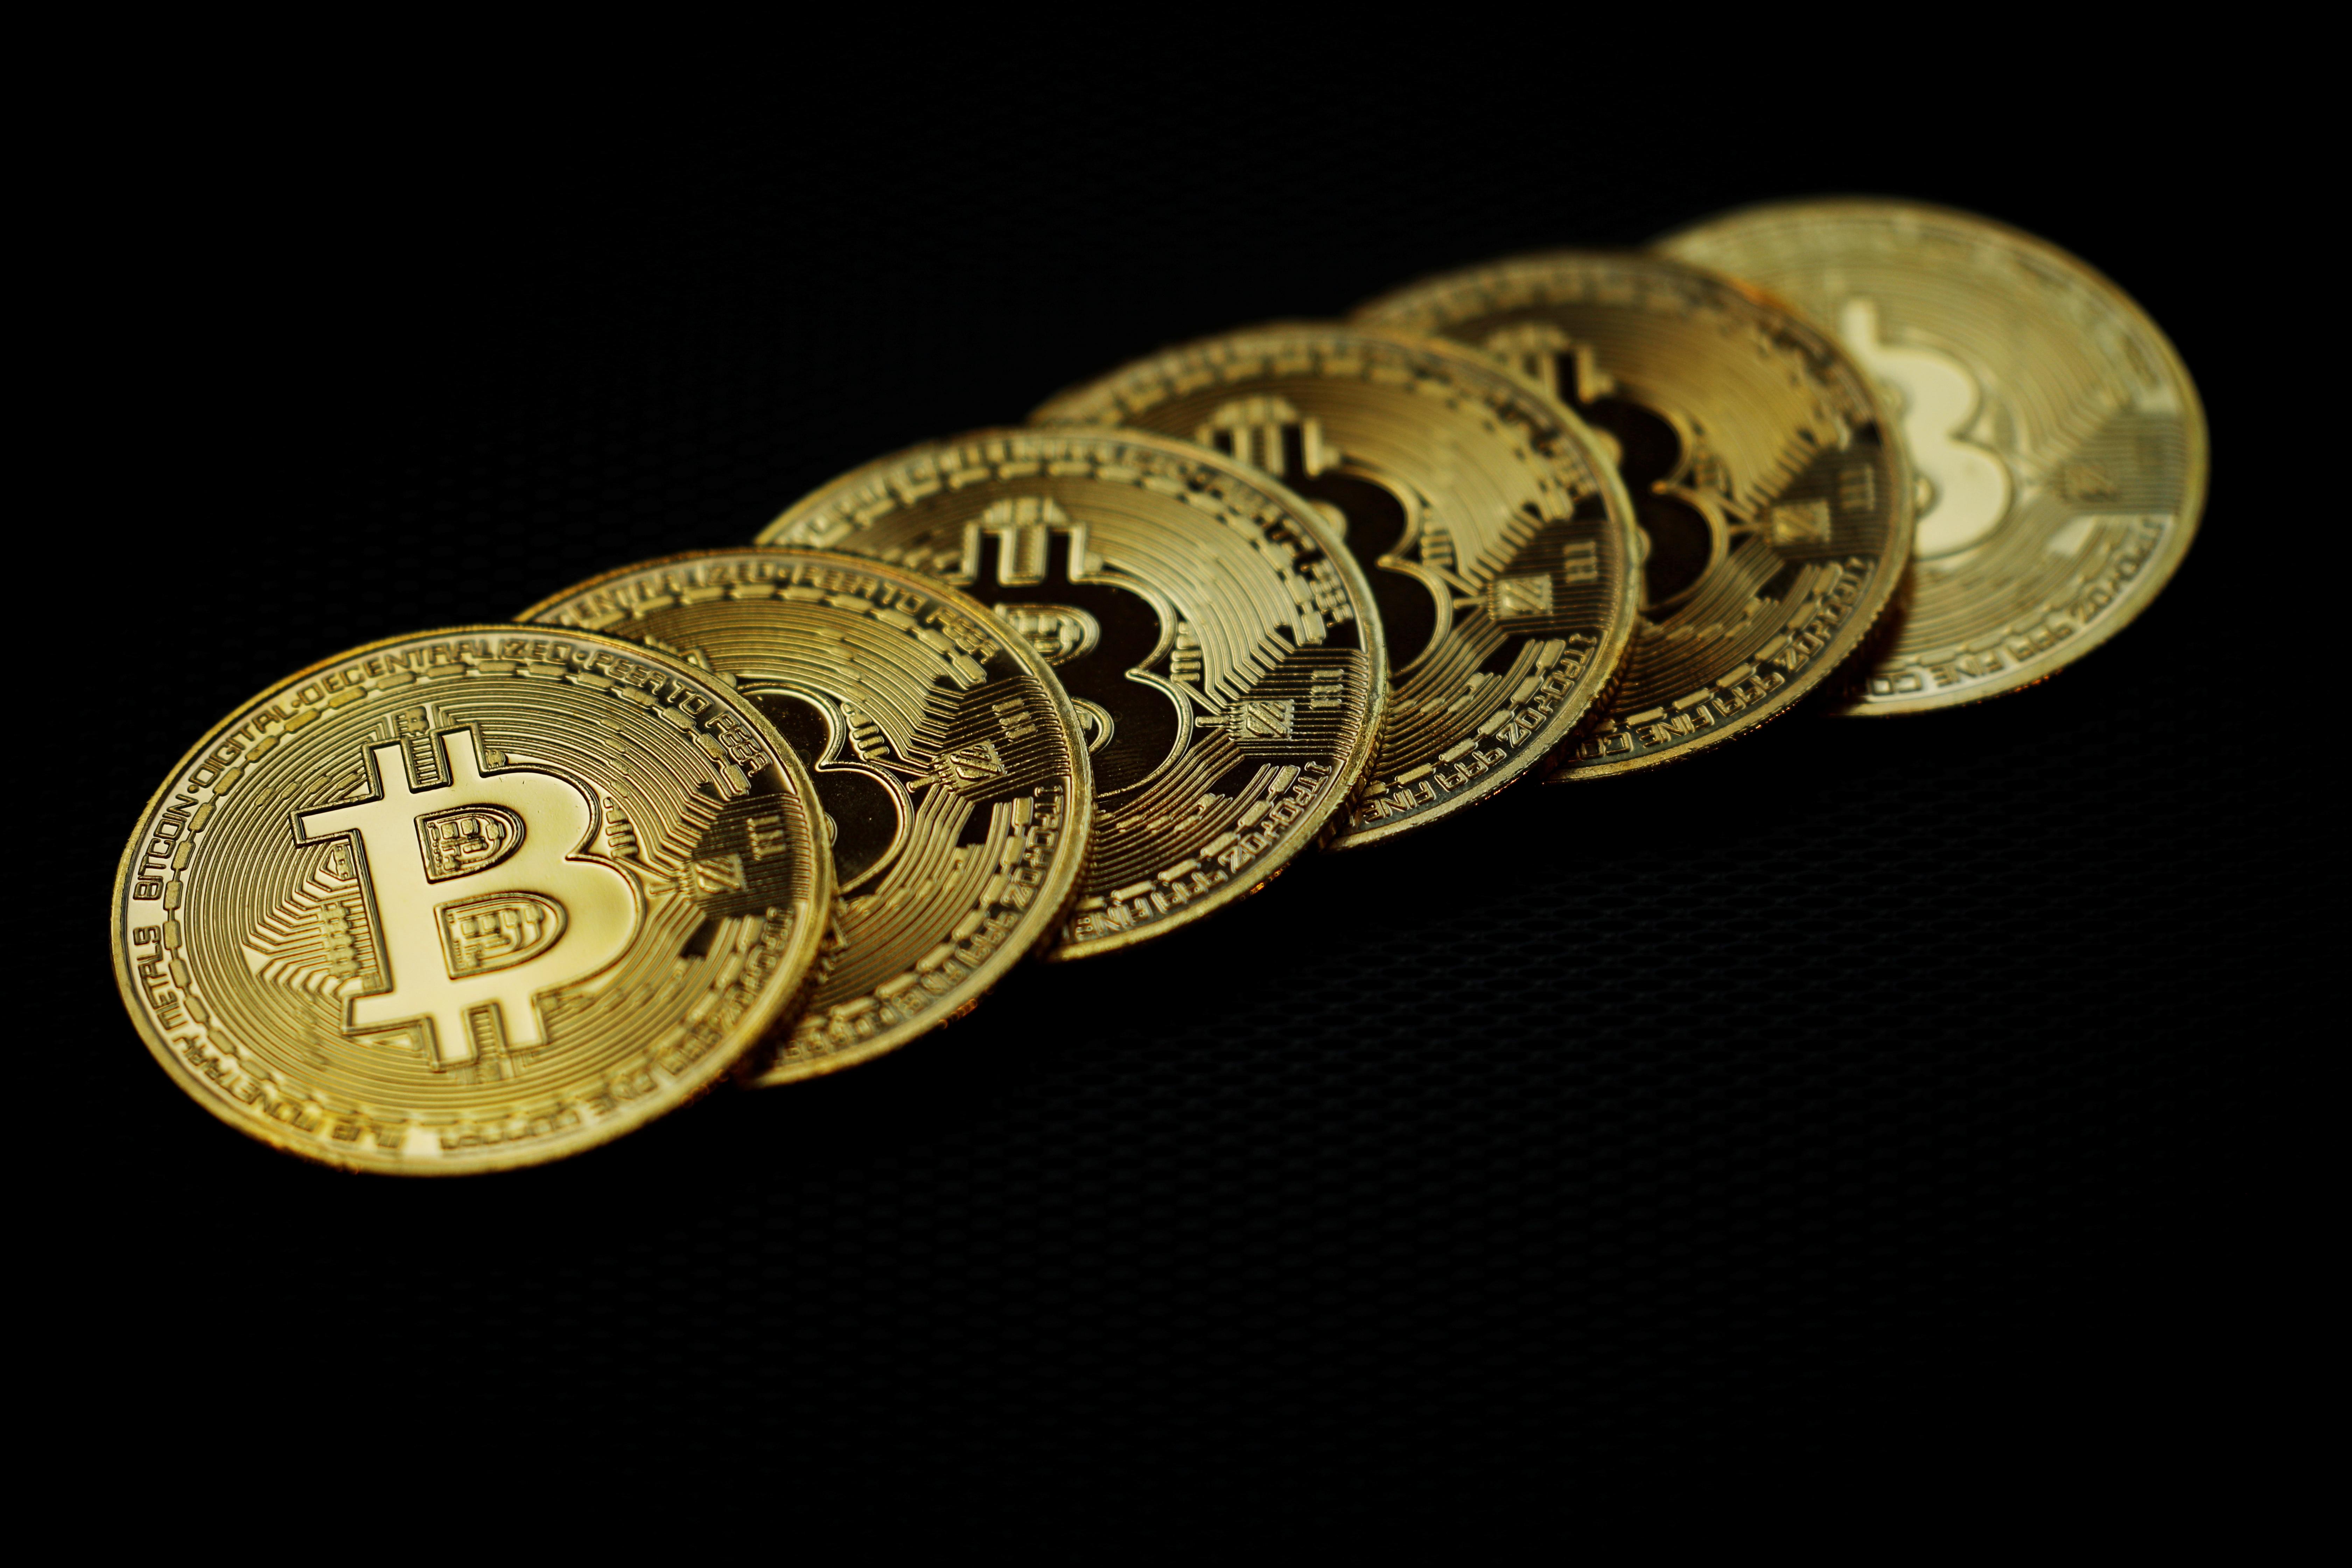 jk bitcoin trade